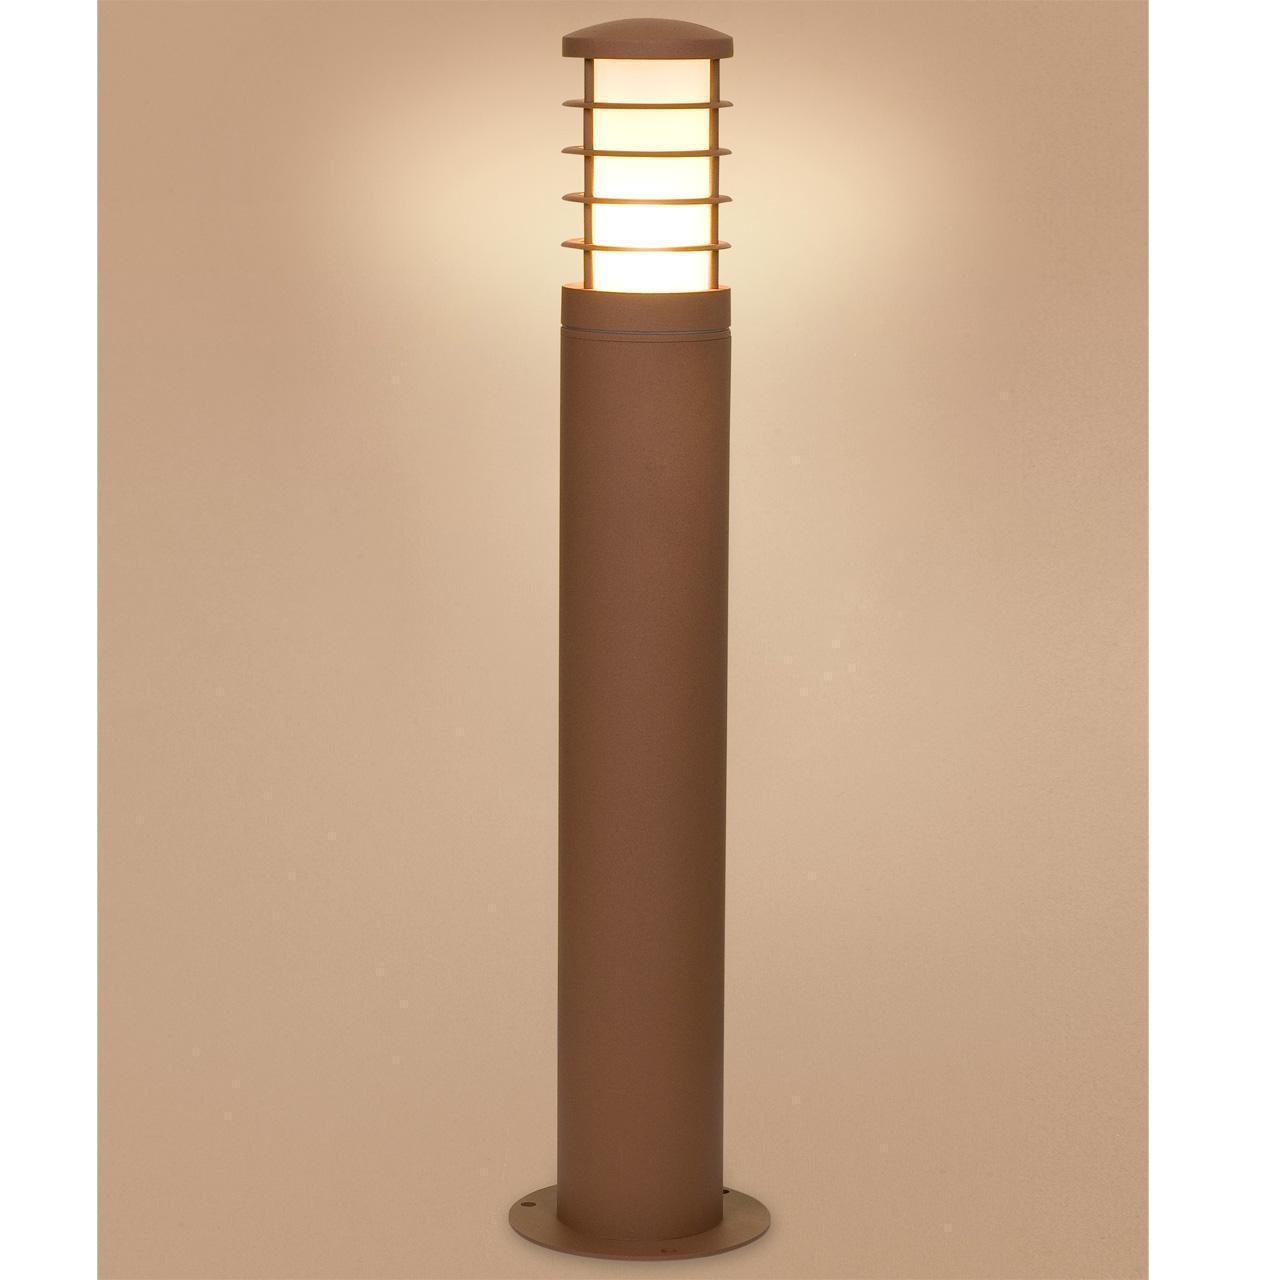 Уличный светильник Nowodvorski Horn 4906 110db loud security alarm siren horn speaker buzzer black red dc 6 16v